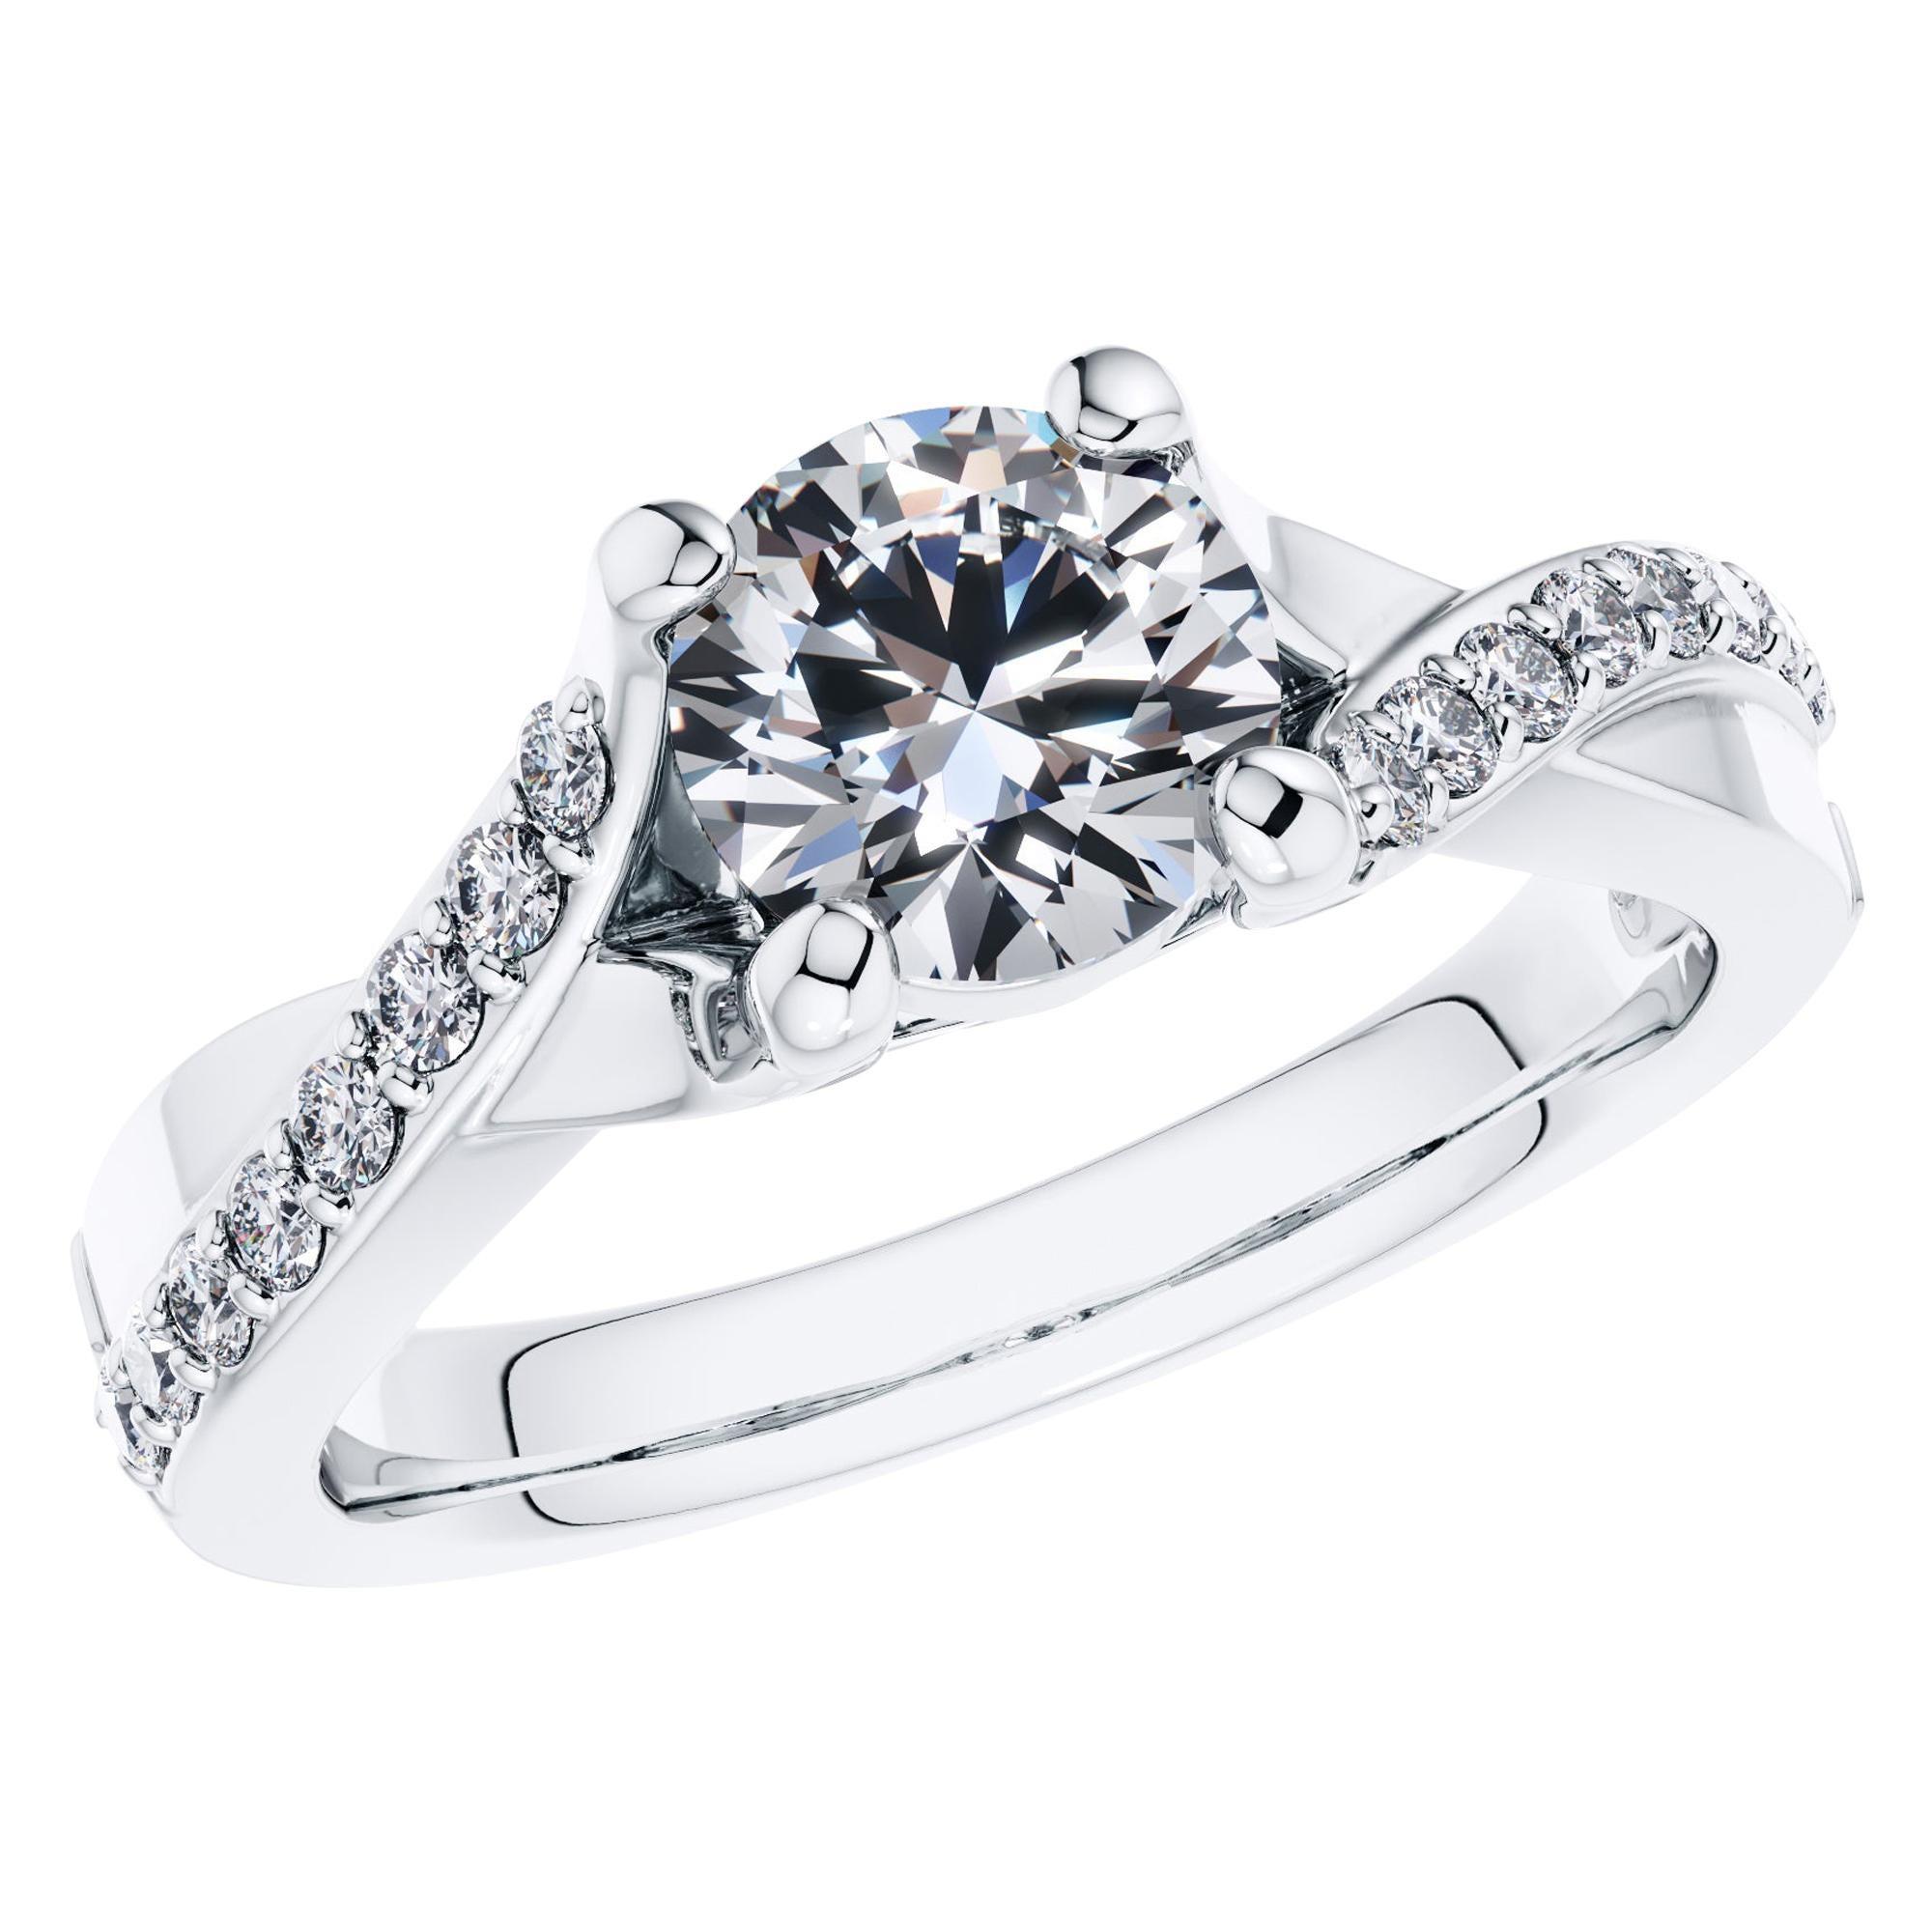 0.50 Carat Round Diamond Bespoke Twisted Love 4 Prong Platinum Engagement Ring